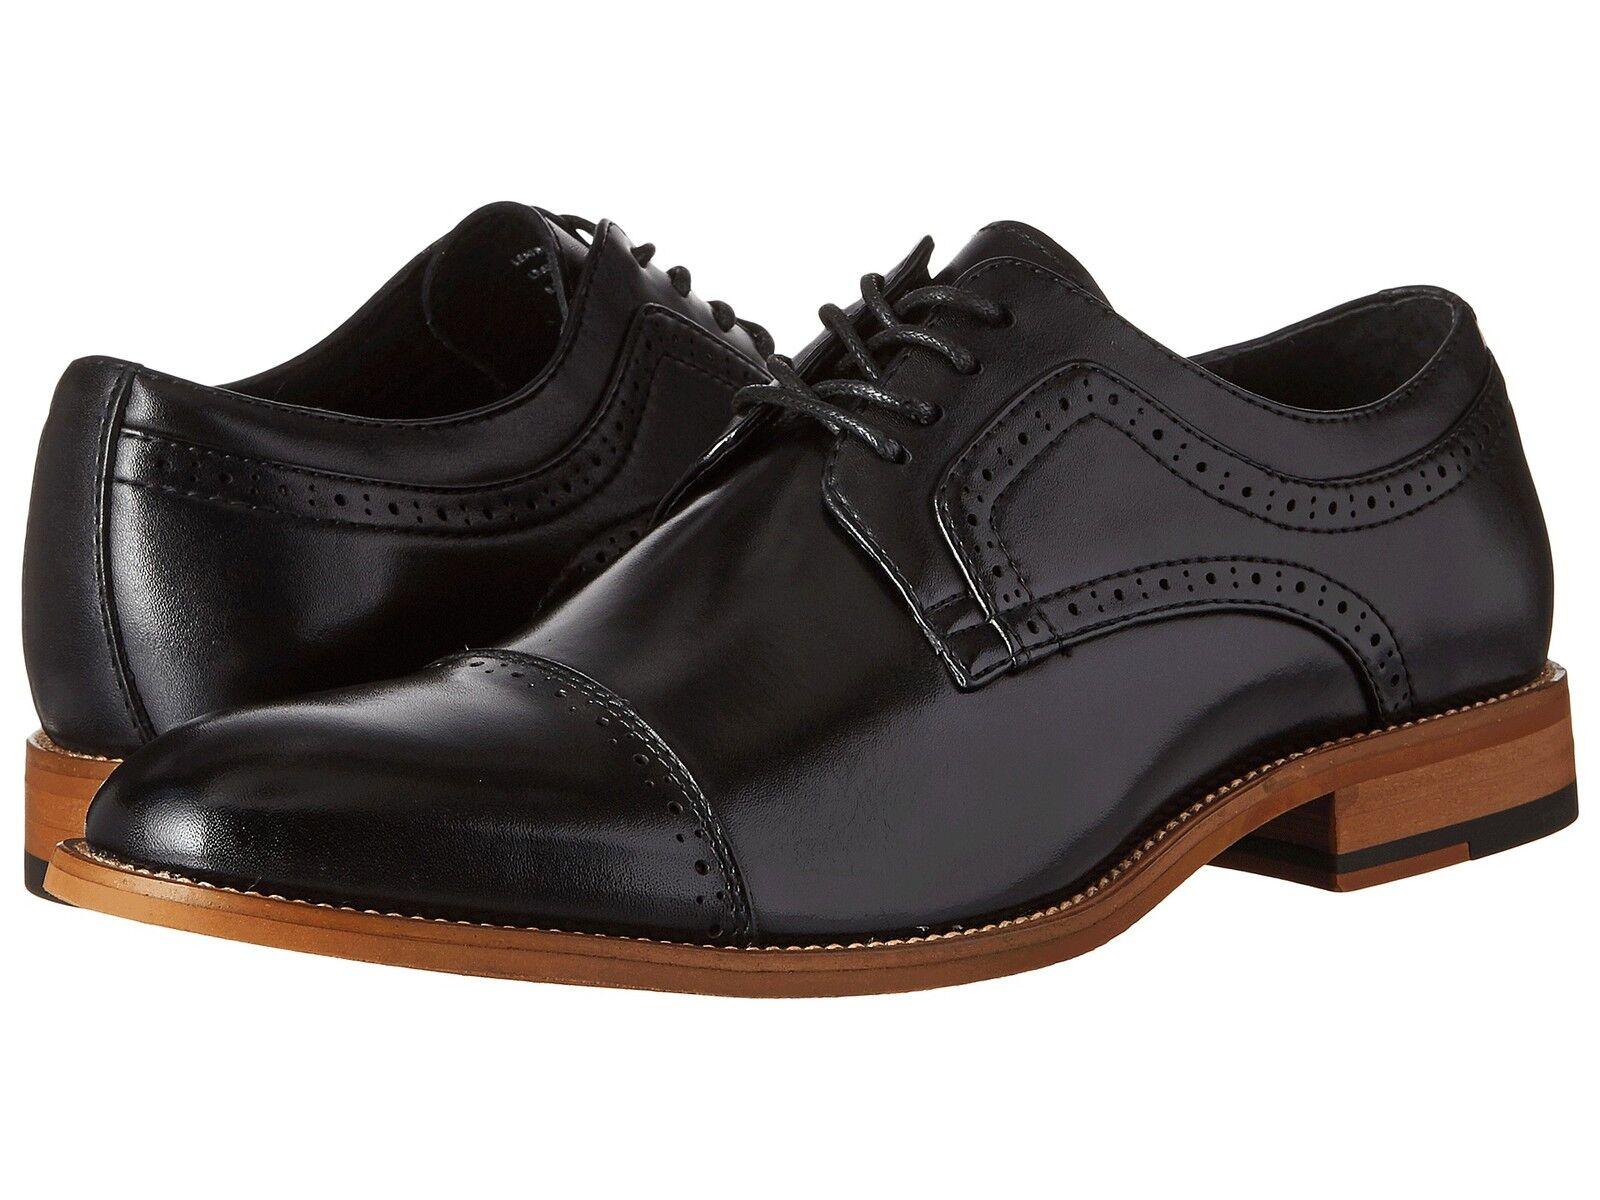 Stacy Adams Men's DICKINSON Cap toe toe toe oxford Black Leather shoes 25066-001 4becc5